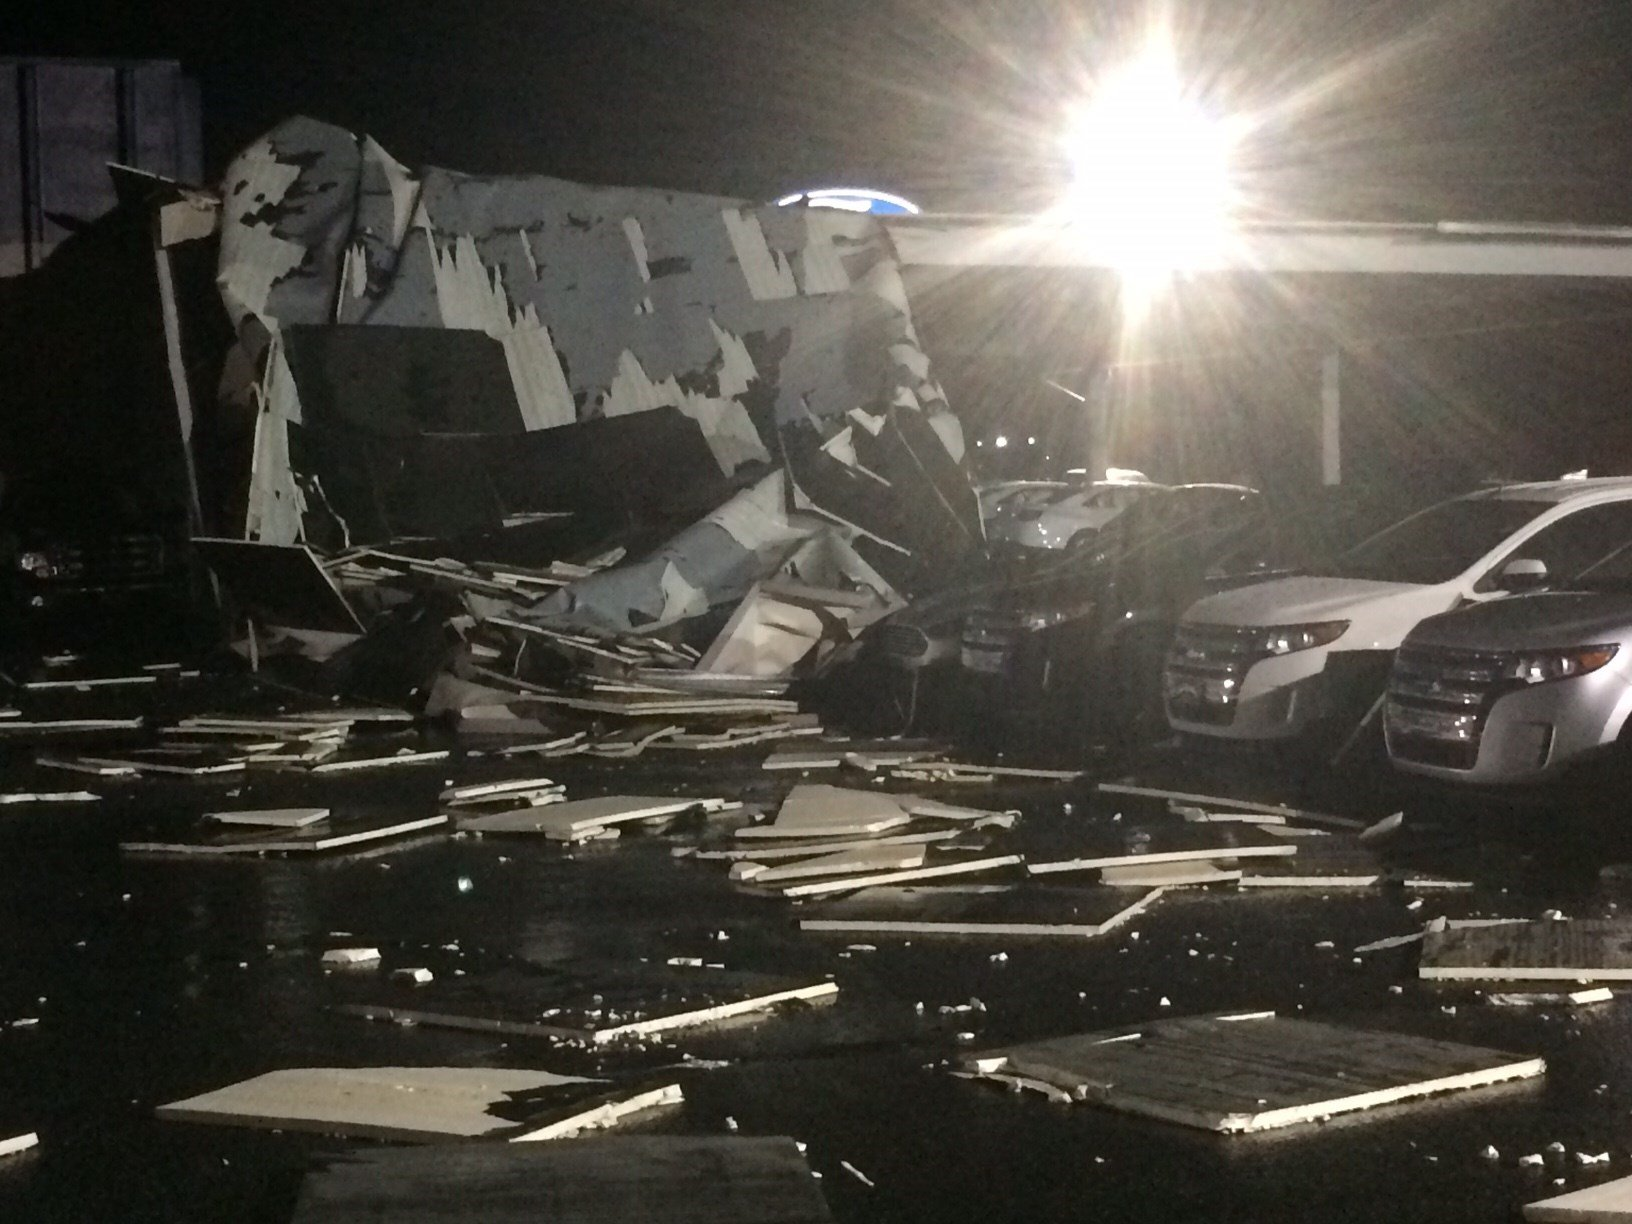 Damage at Sisk Family Ford (March 1, 2017 FOX Carolina)